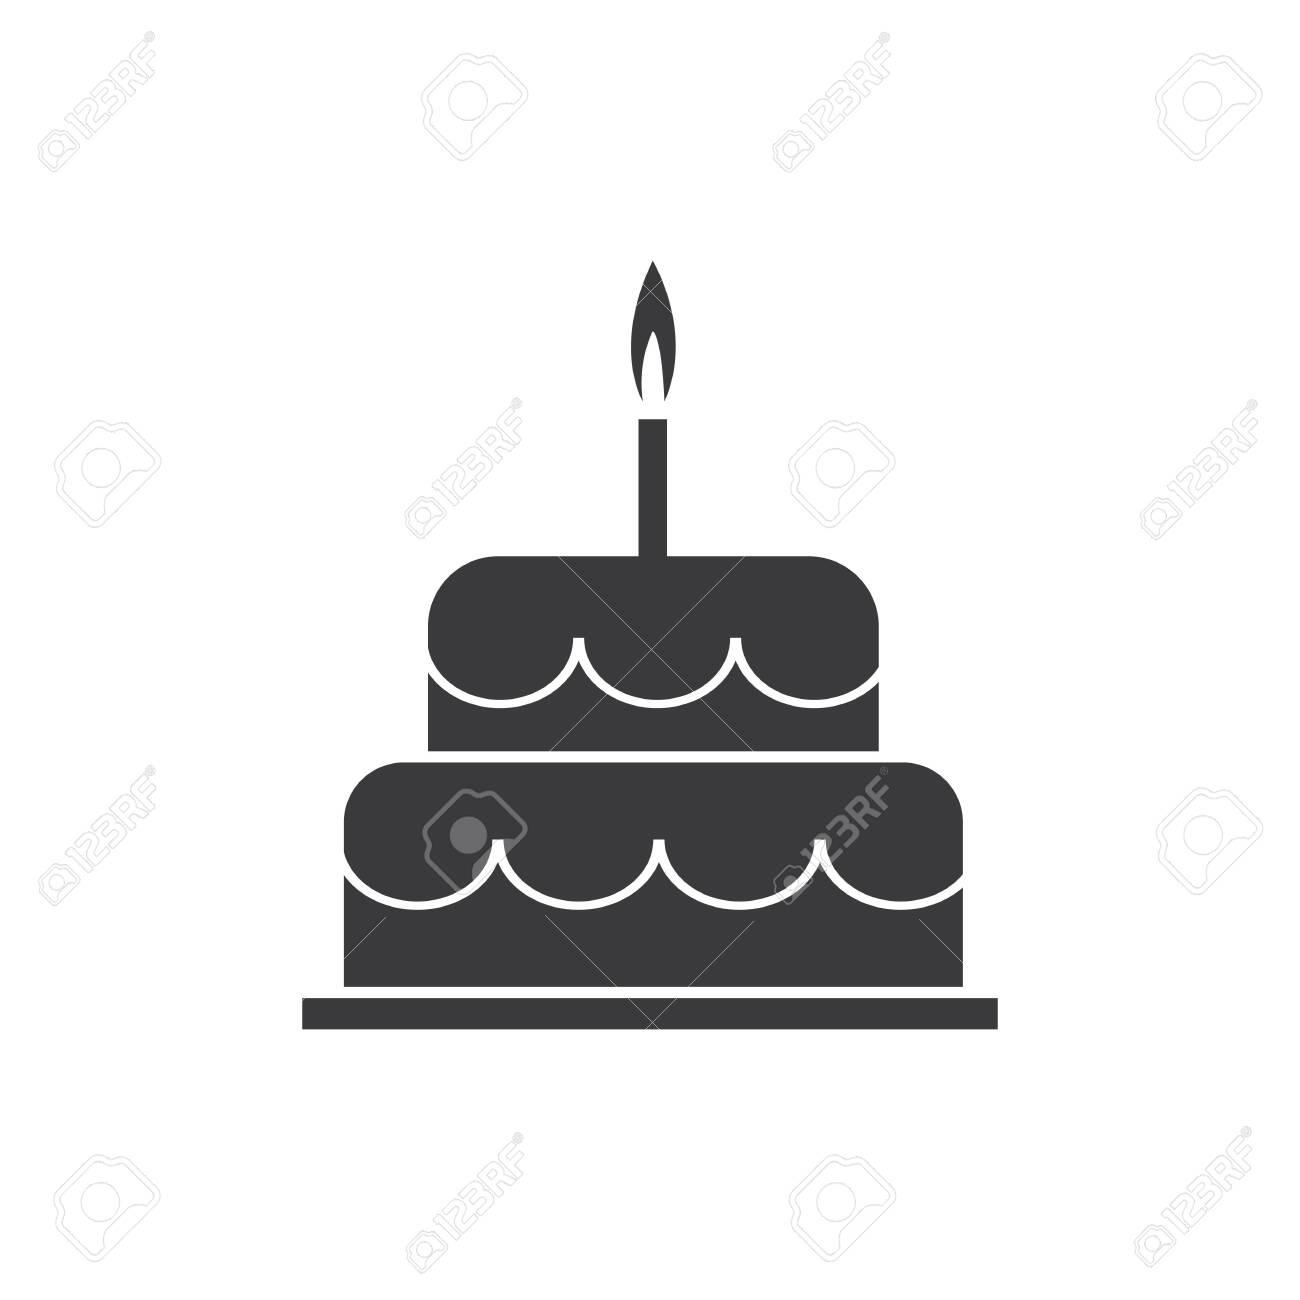 Fabulous Birthday Cake Icon Vector Design Template Royalty Free Cliparts Funny Birthday Cards Online Kookostrdamsfinfo